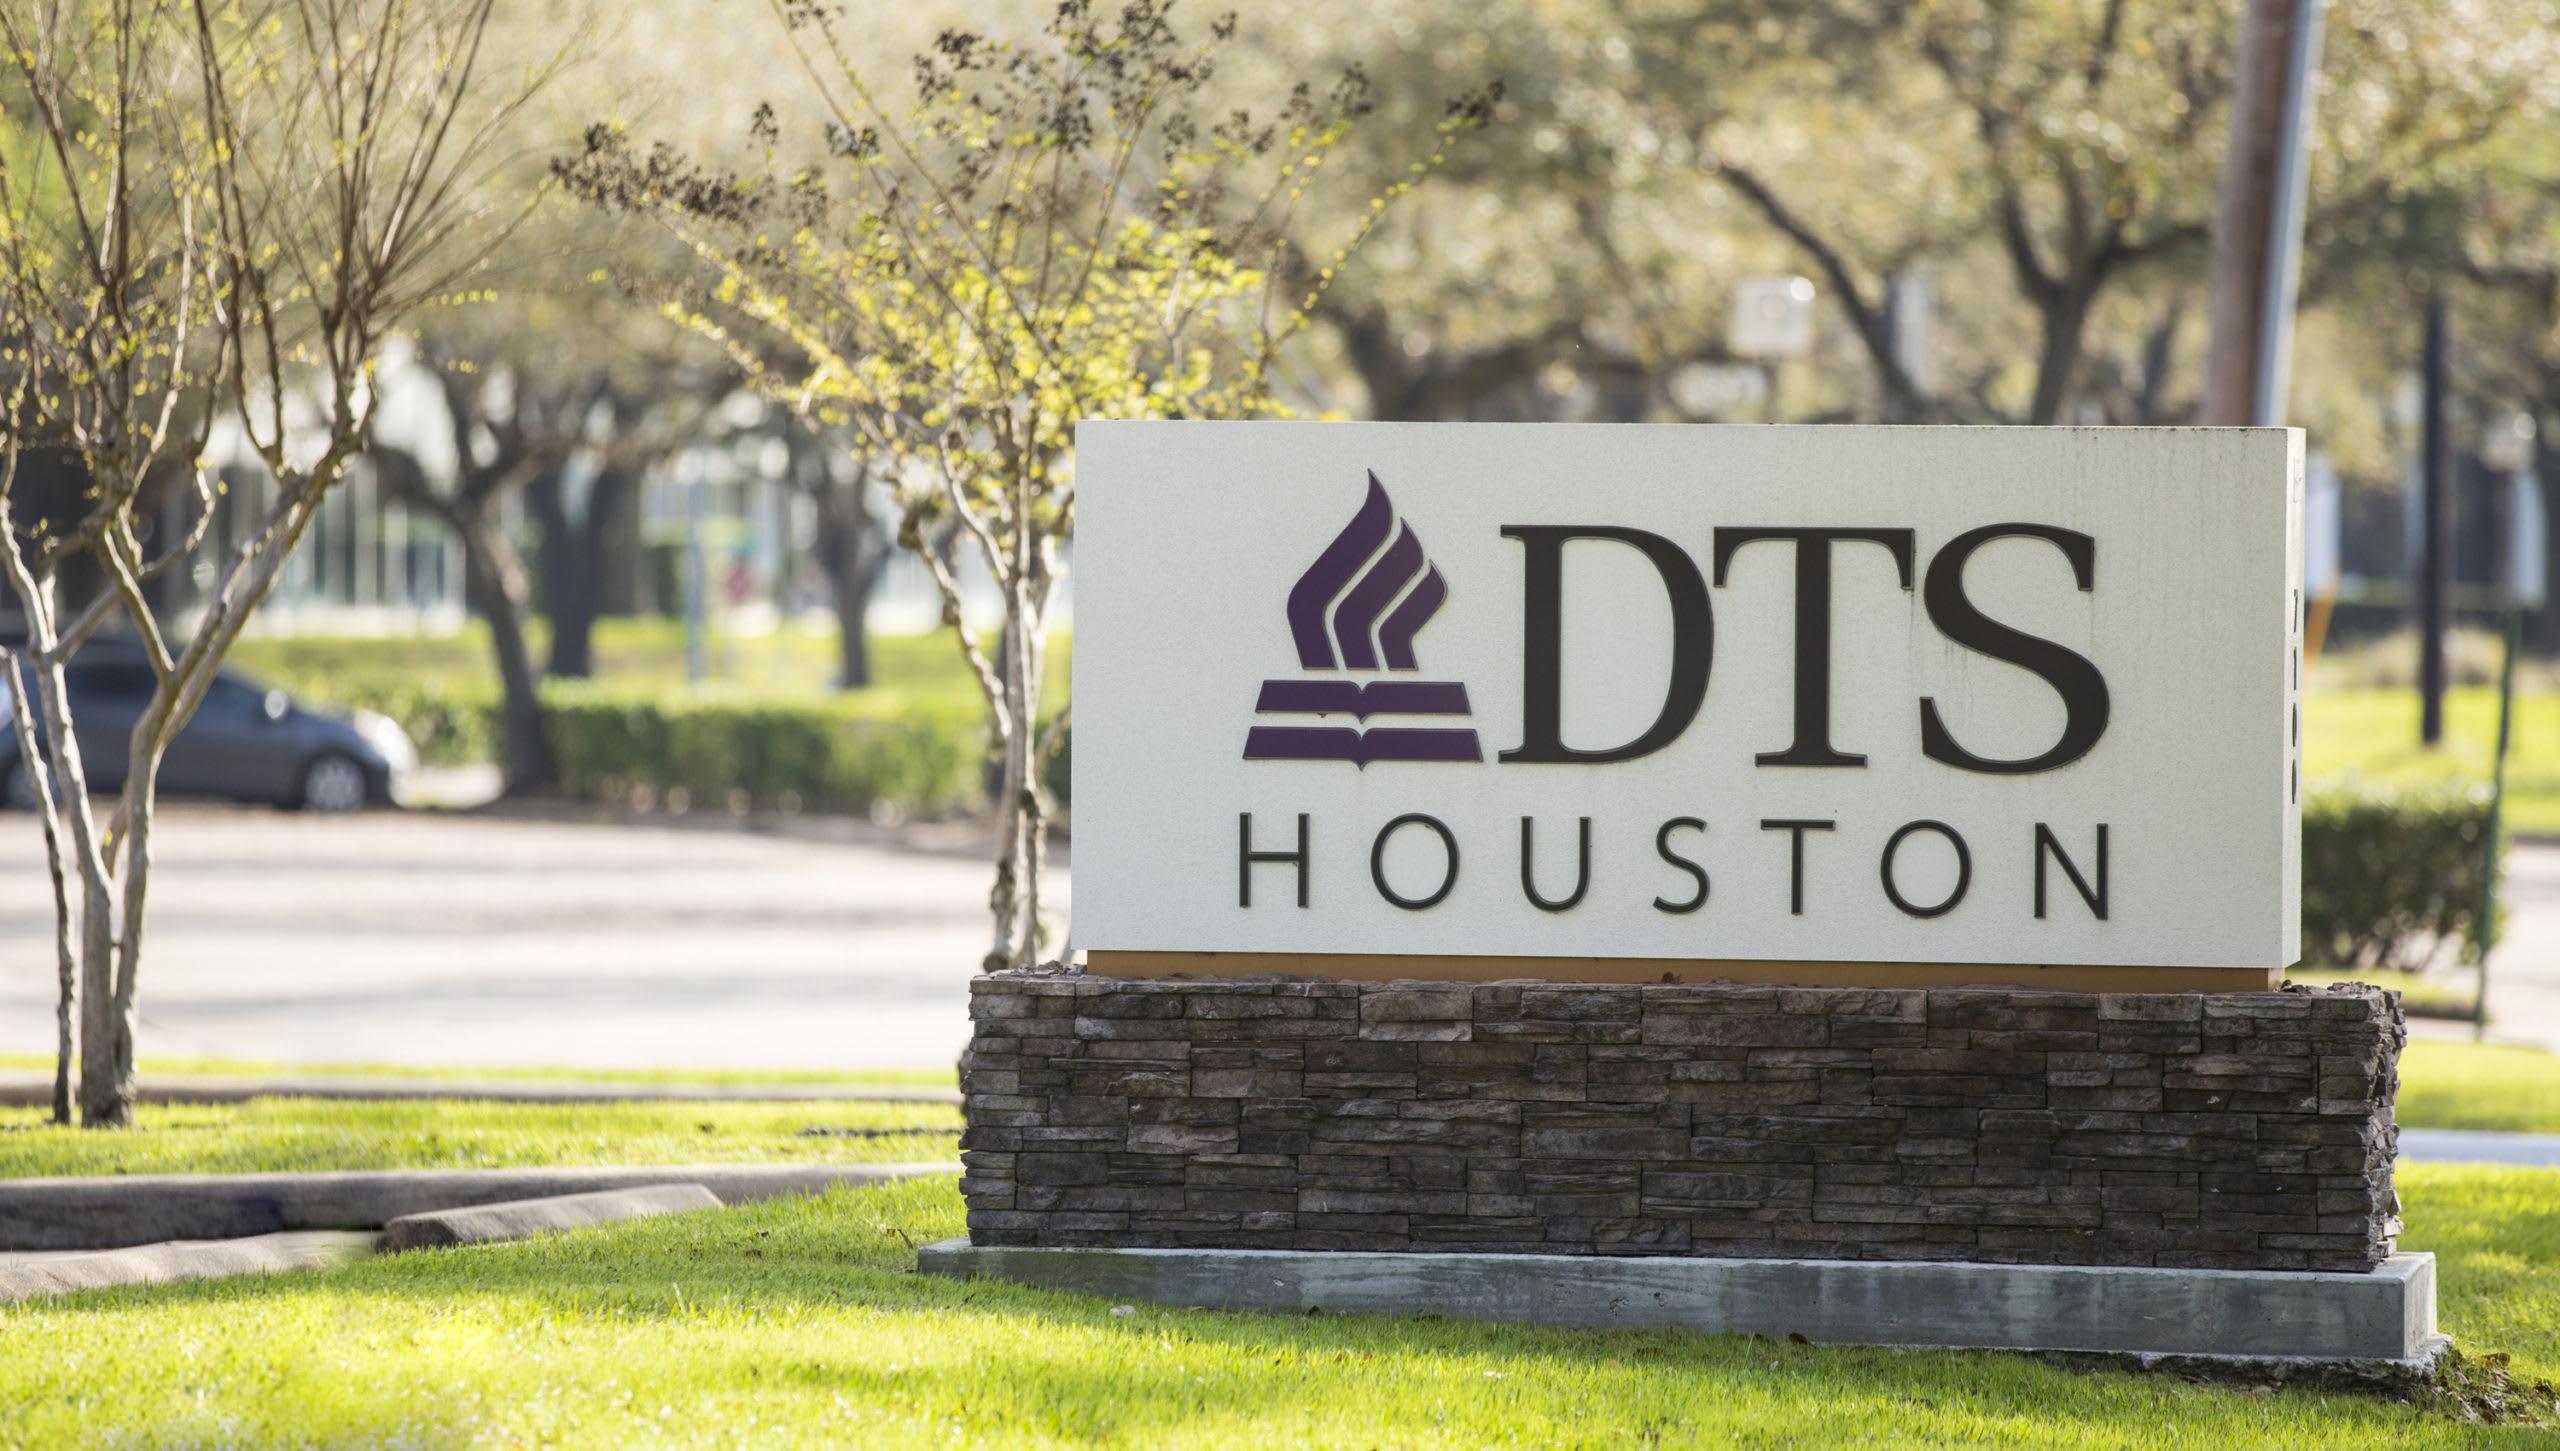 DTS Houston sign